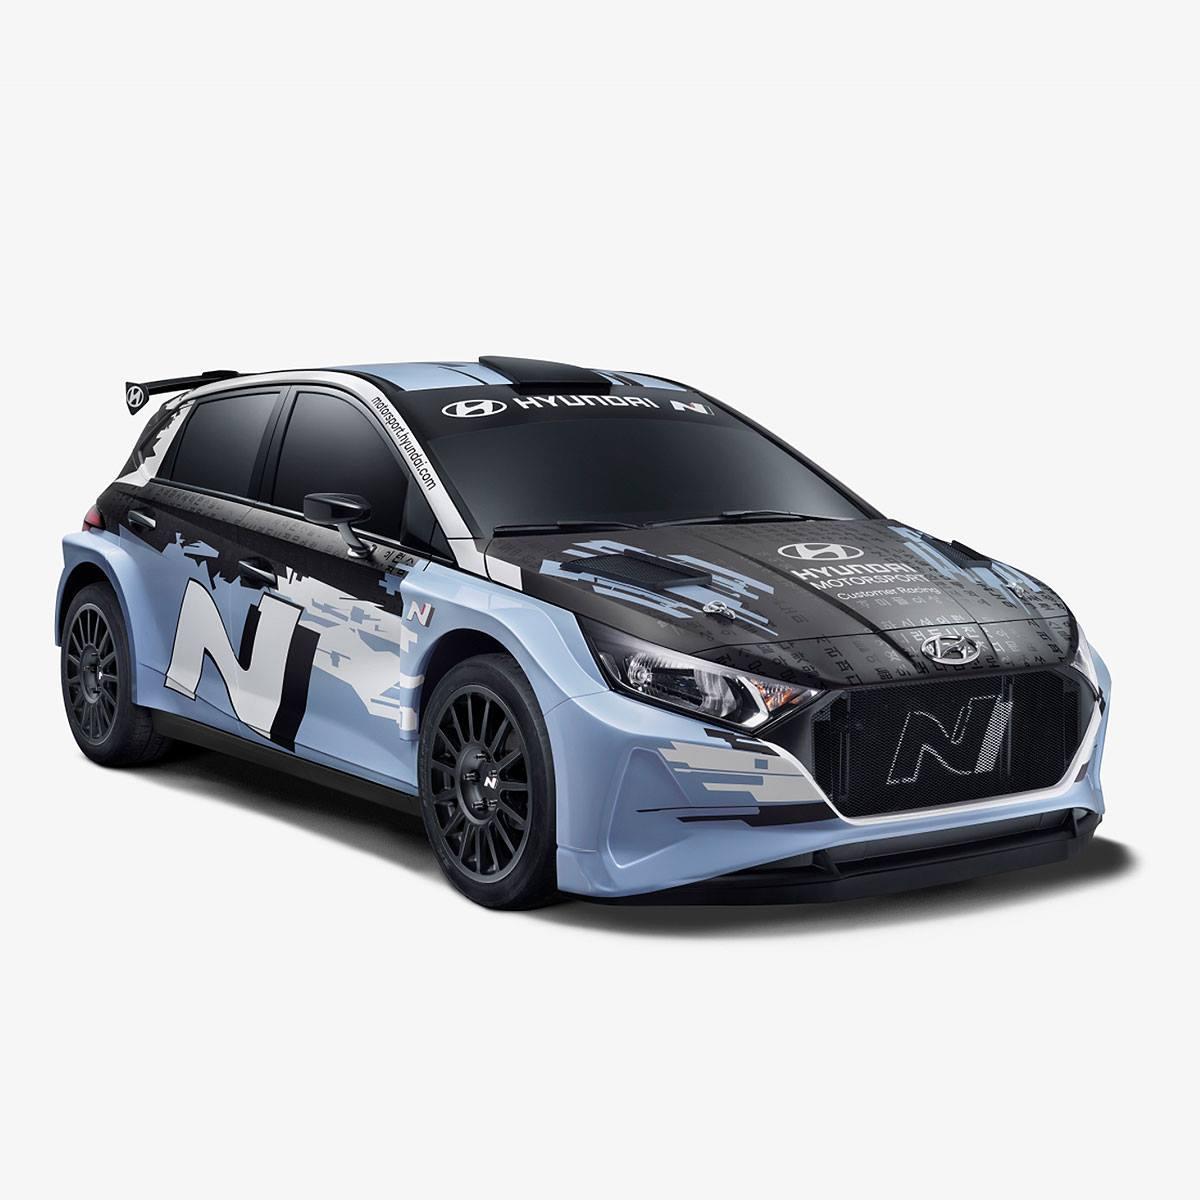 Hyundai-i20-N-rally-1